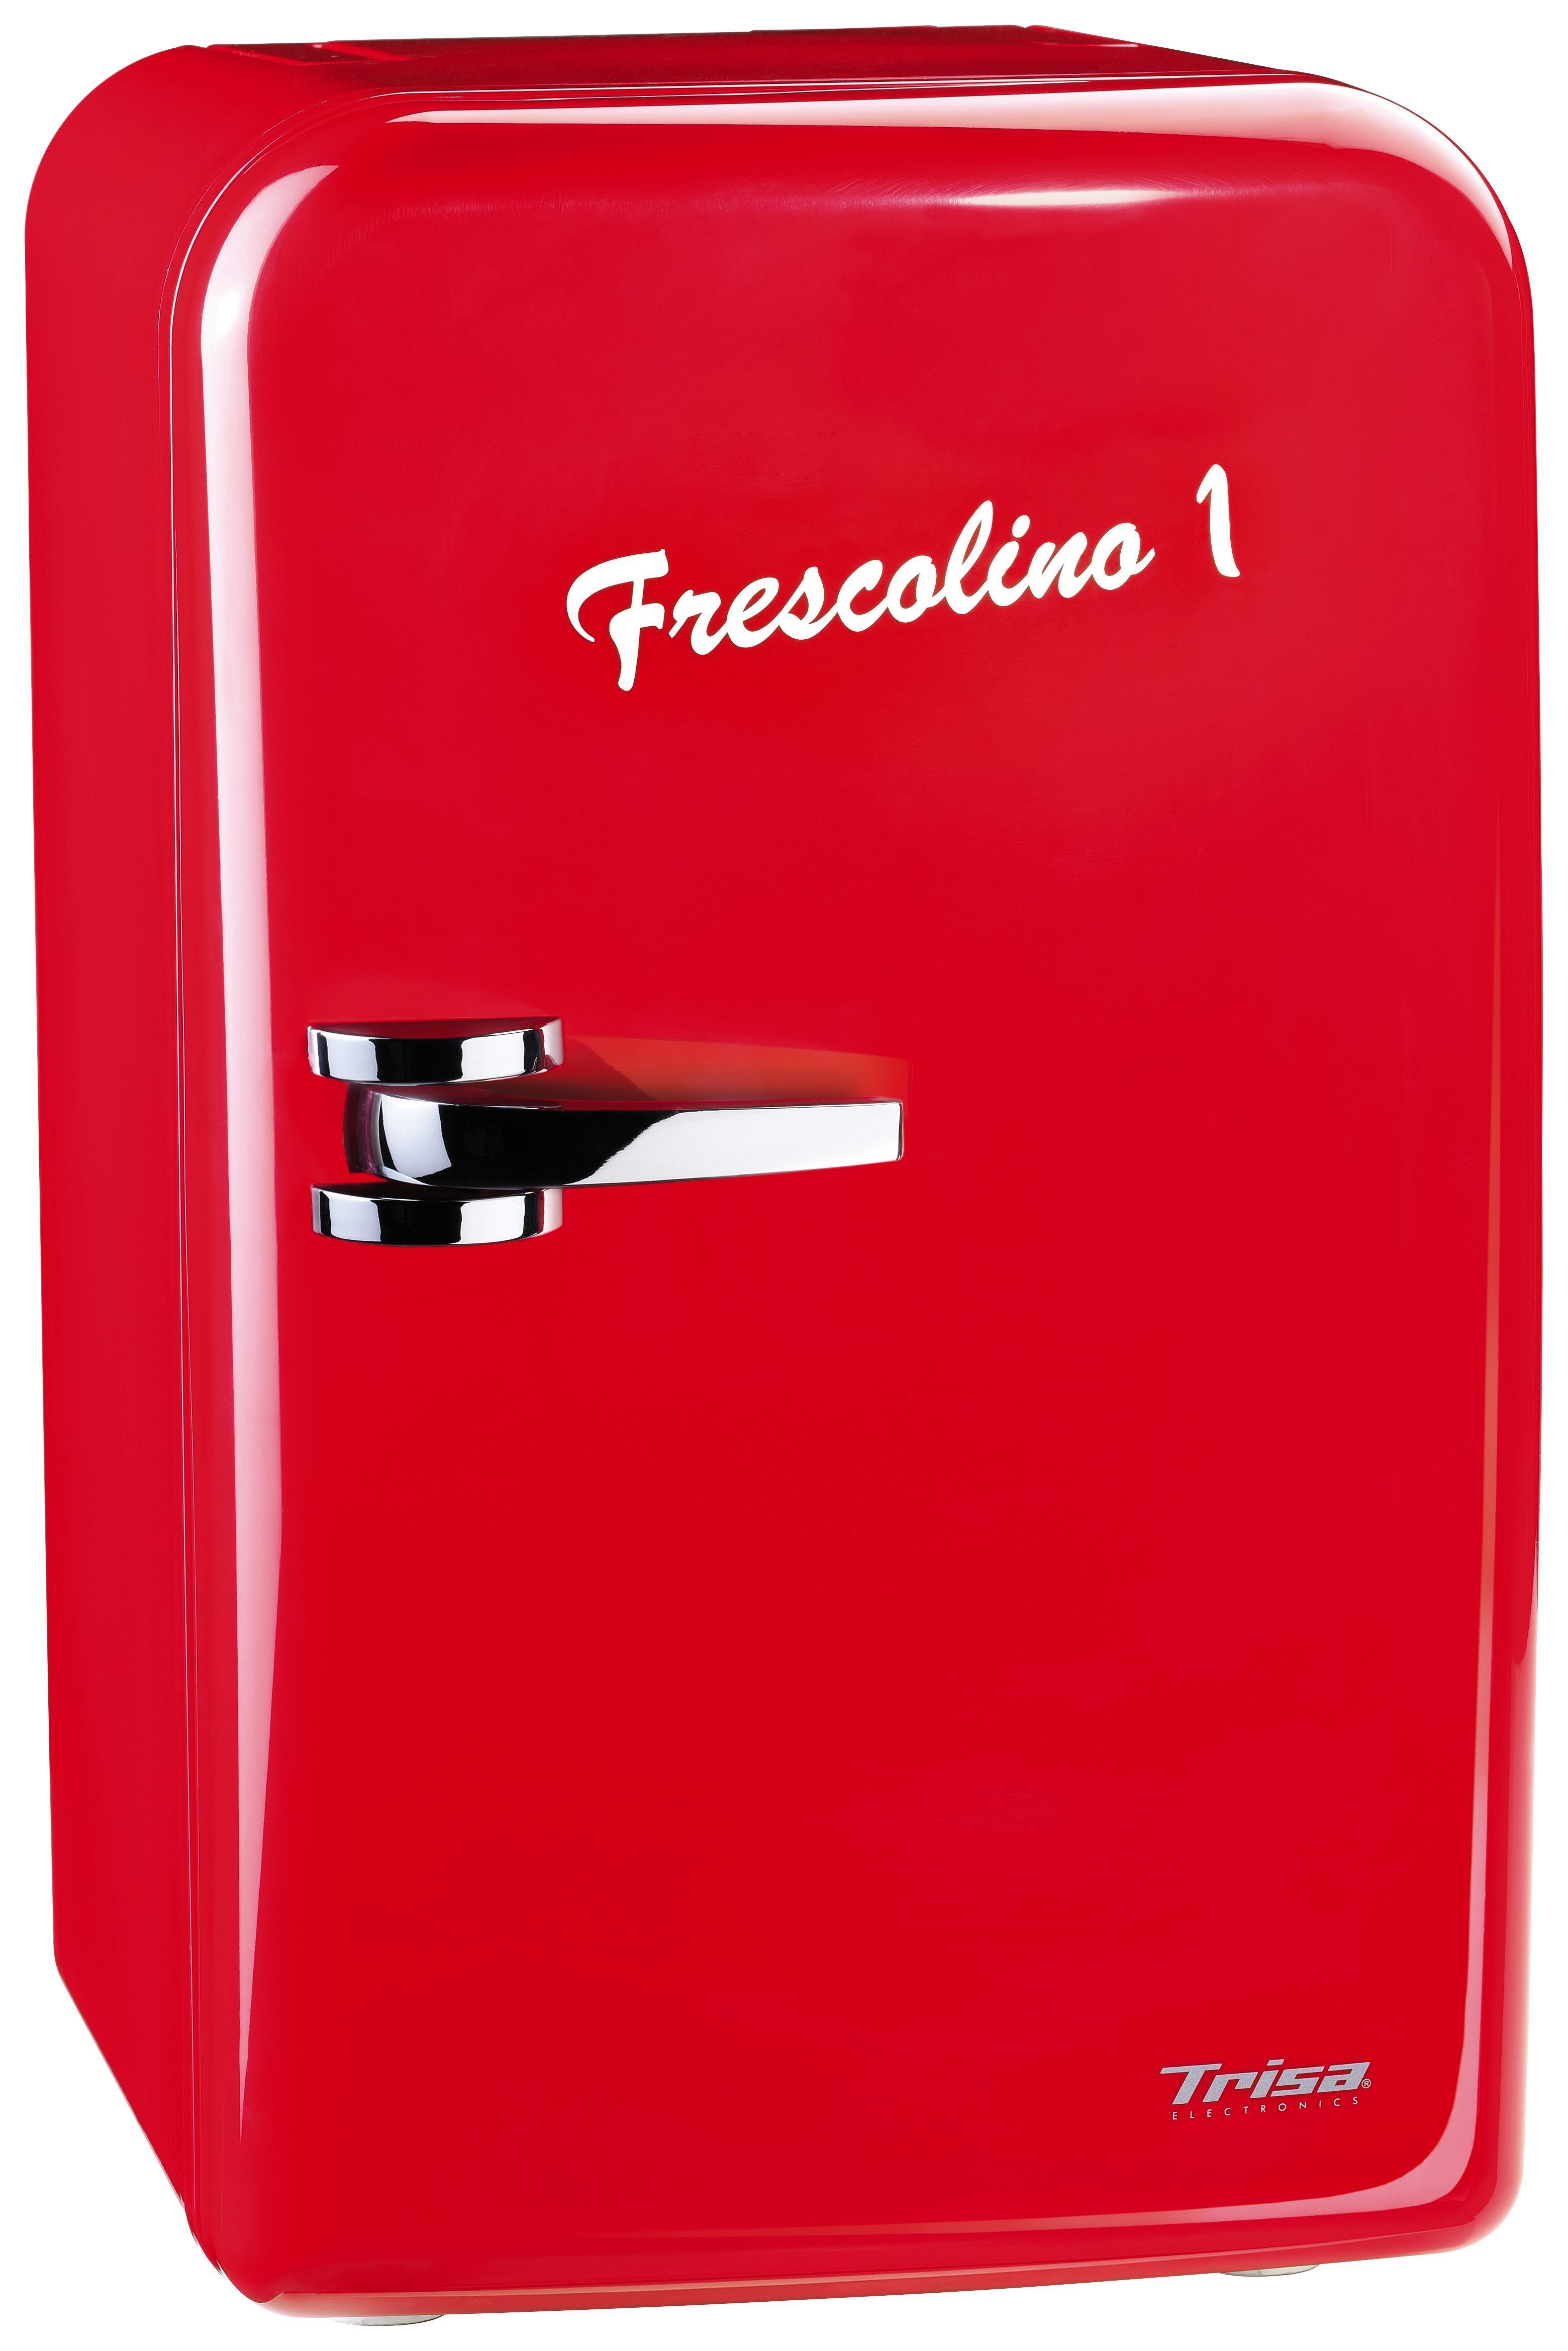 Mini Kühlschrank Mit Akku : Minikühlschrank frescolino online kaufen ➤ möbelix